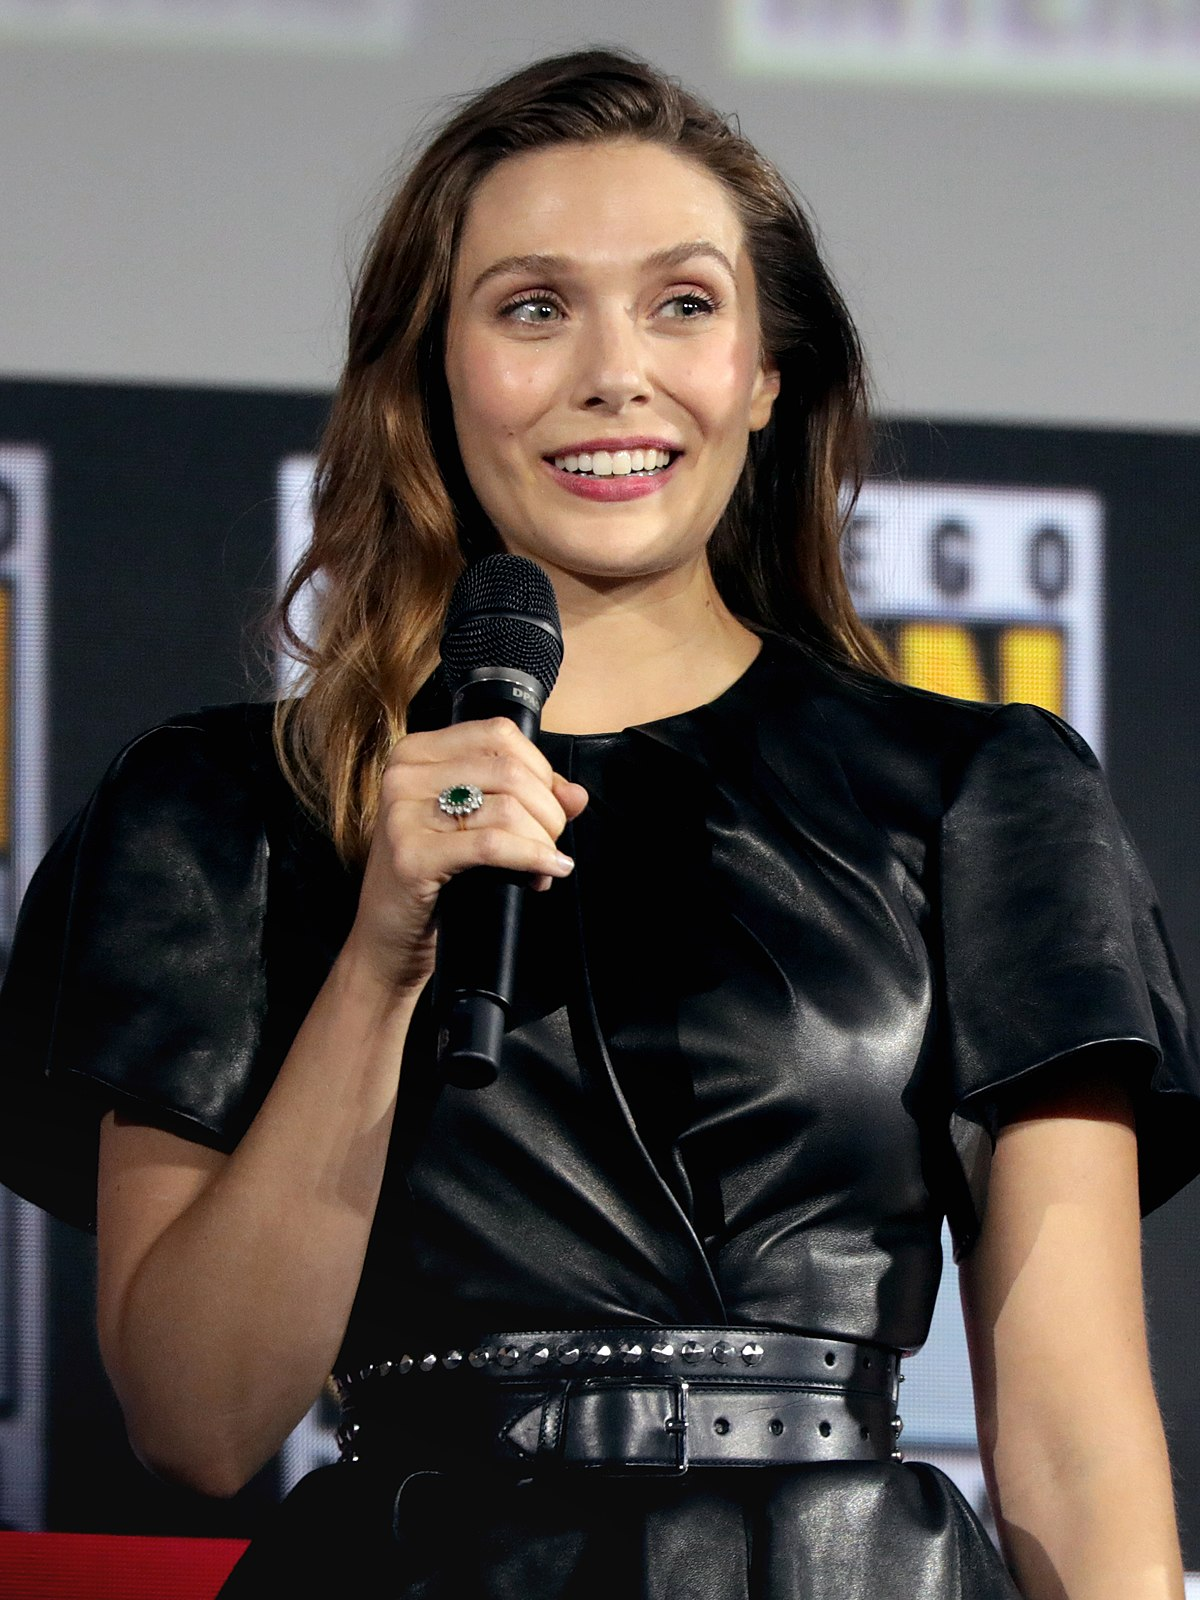 Elizabeth Olsen - Wikipedia